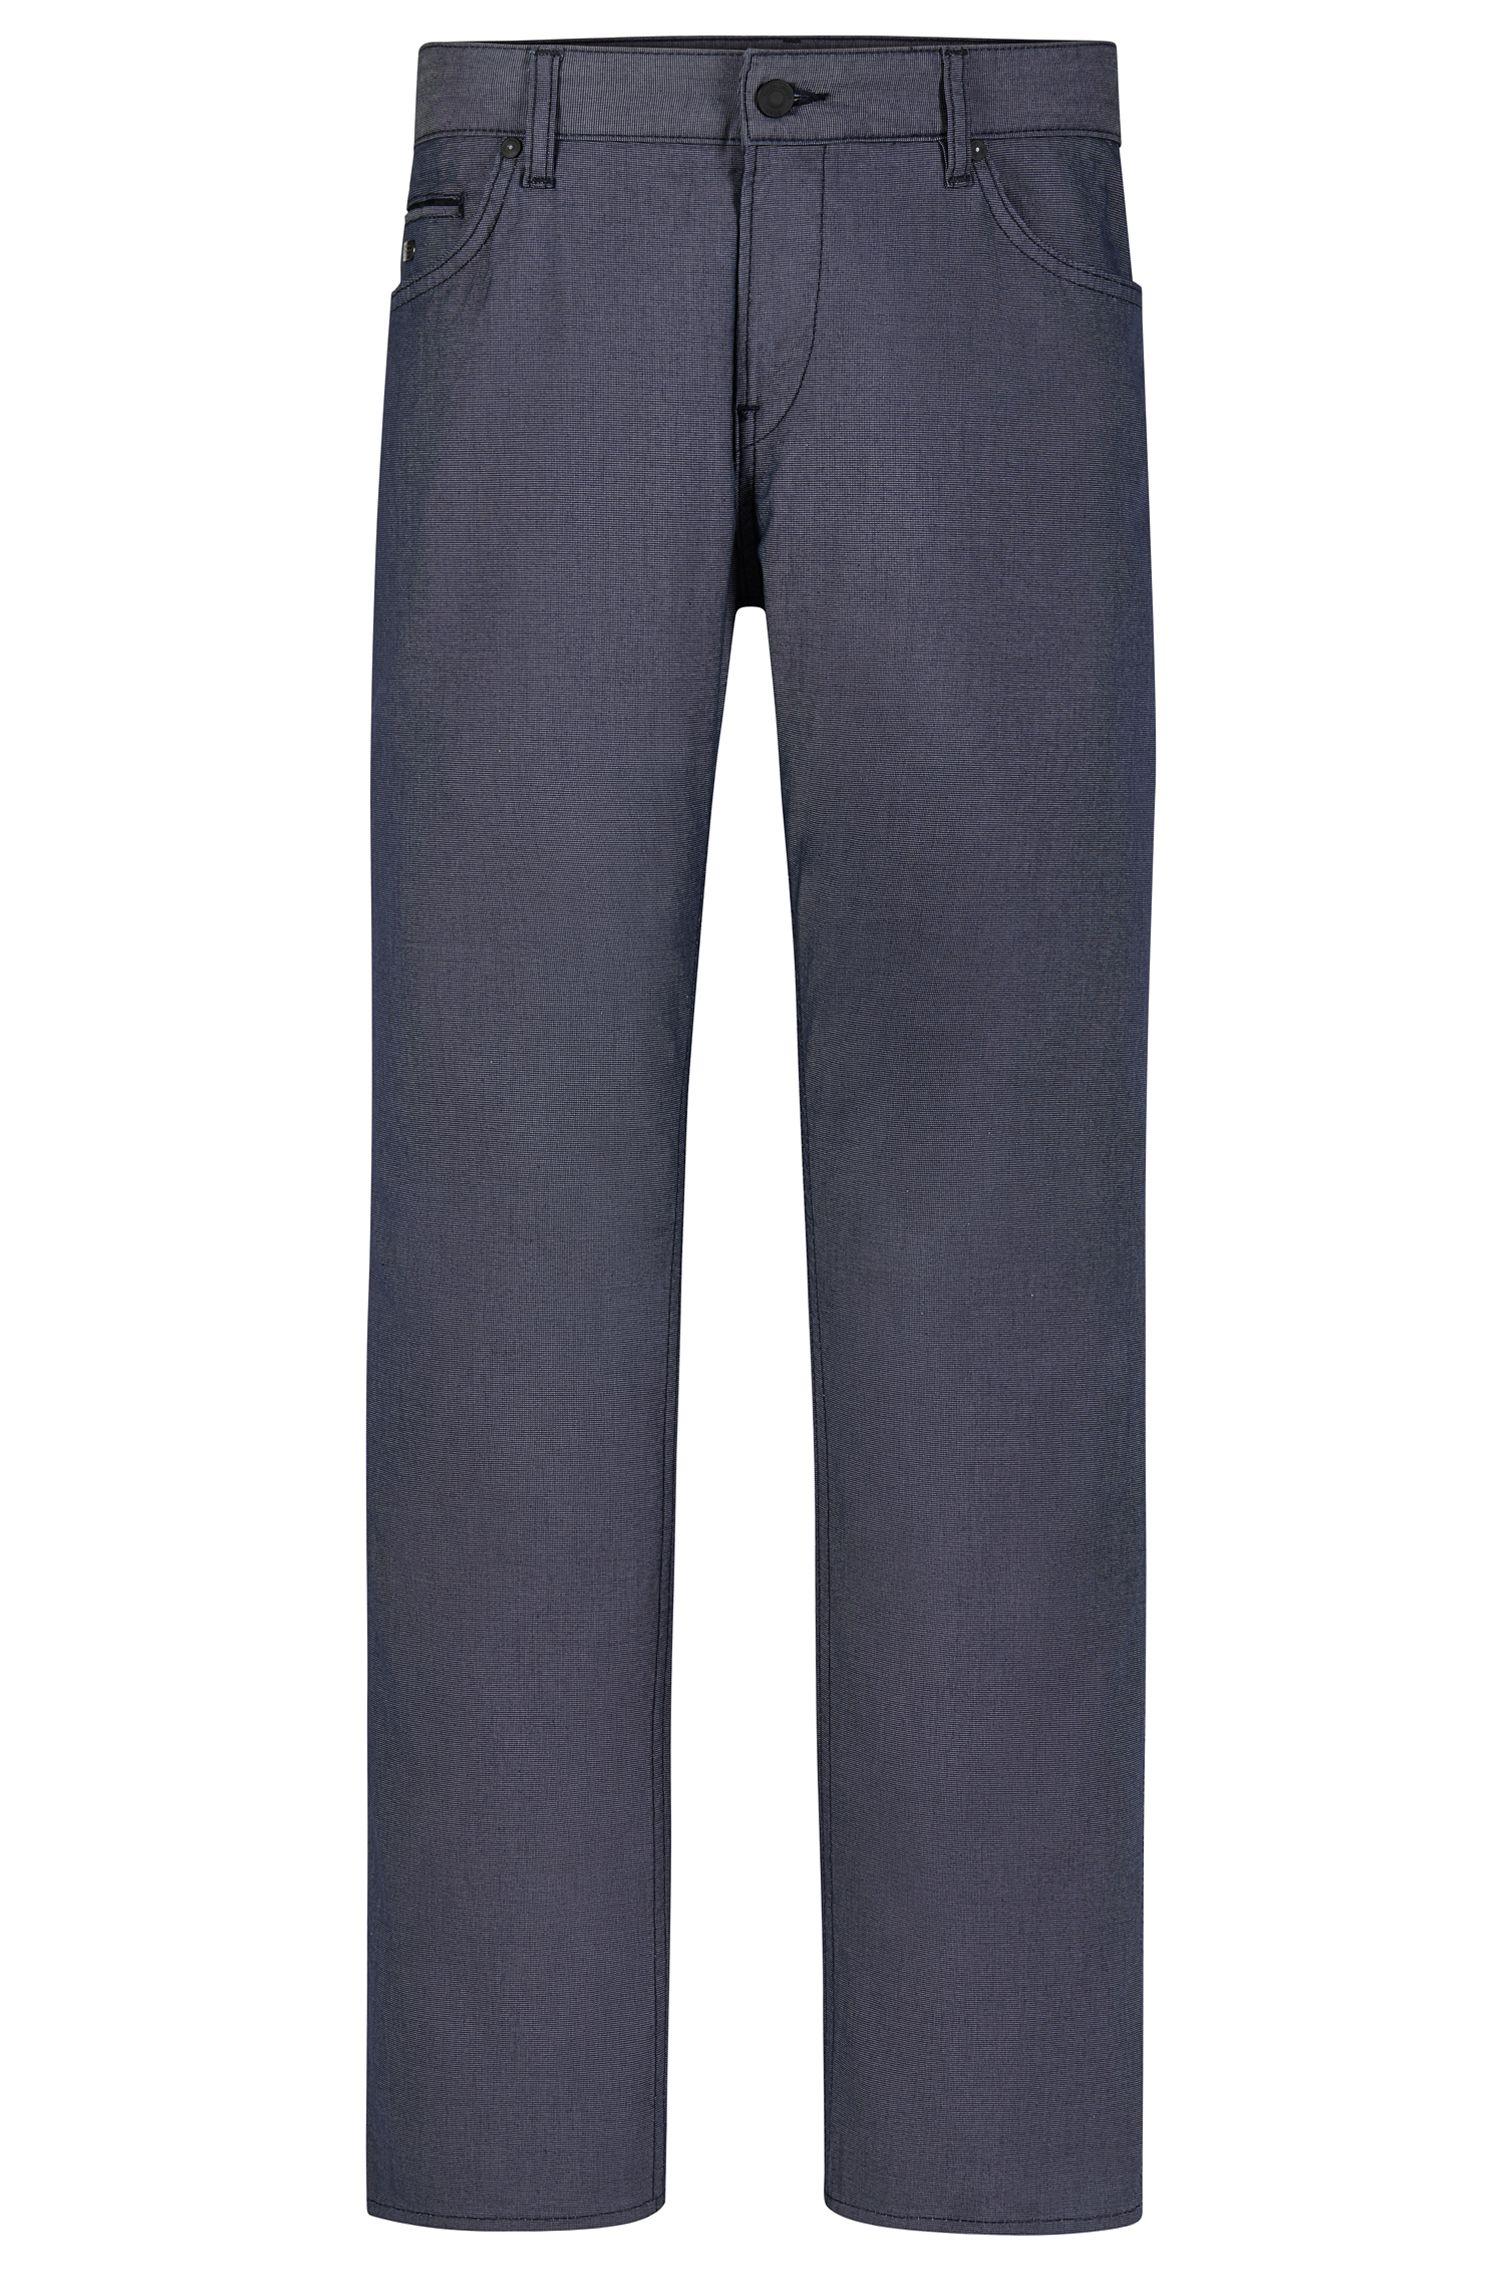 Stretch Cotton Jeans, Slim FIt   C-Delaware